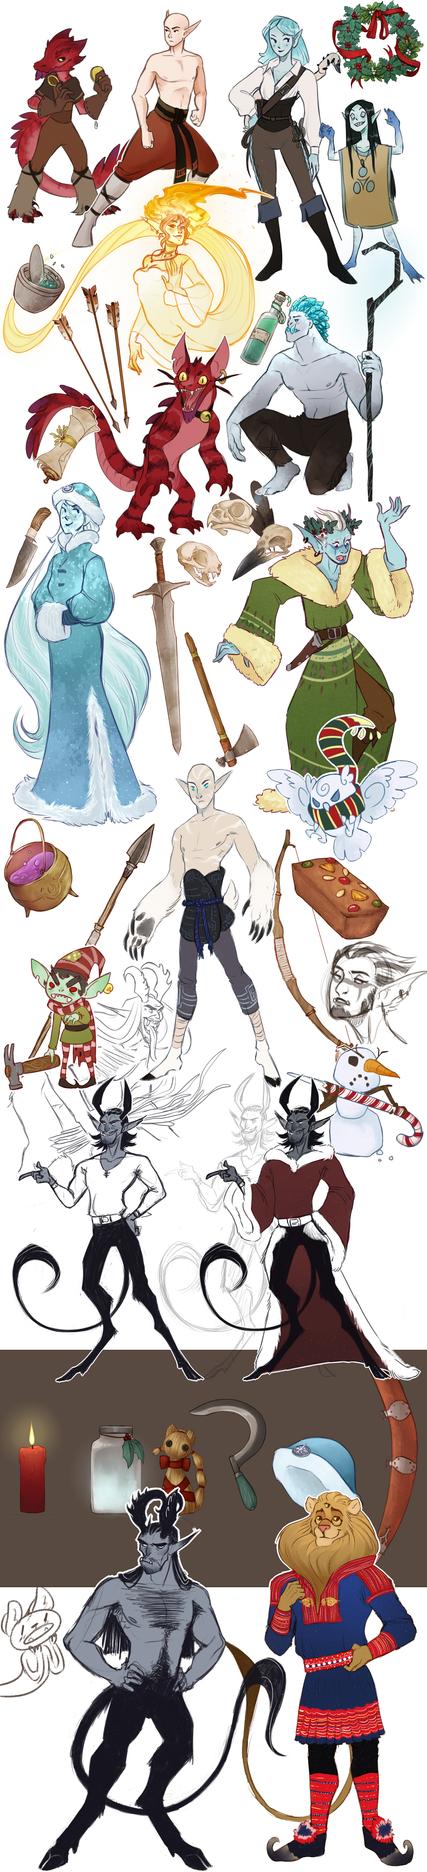 sketchdump! (18-12-16) by Riurekai